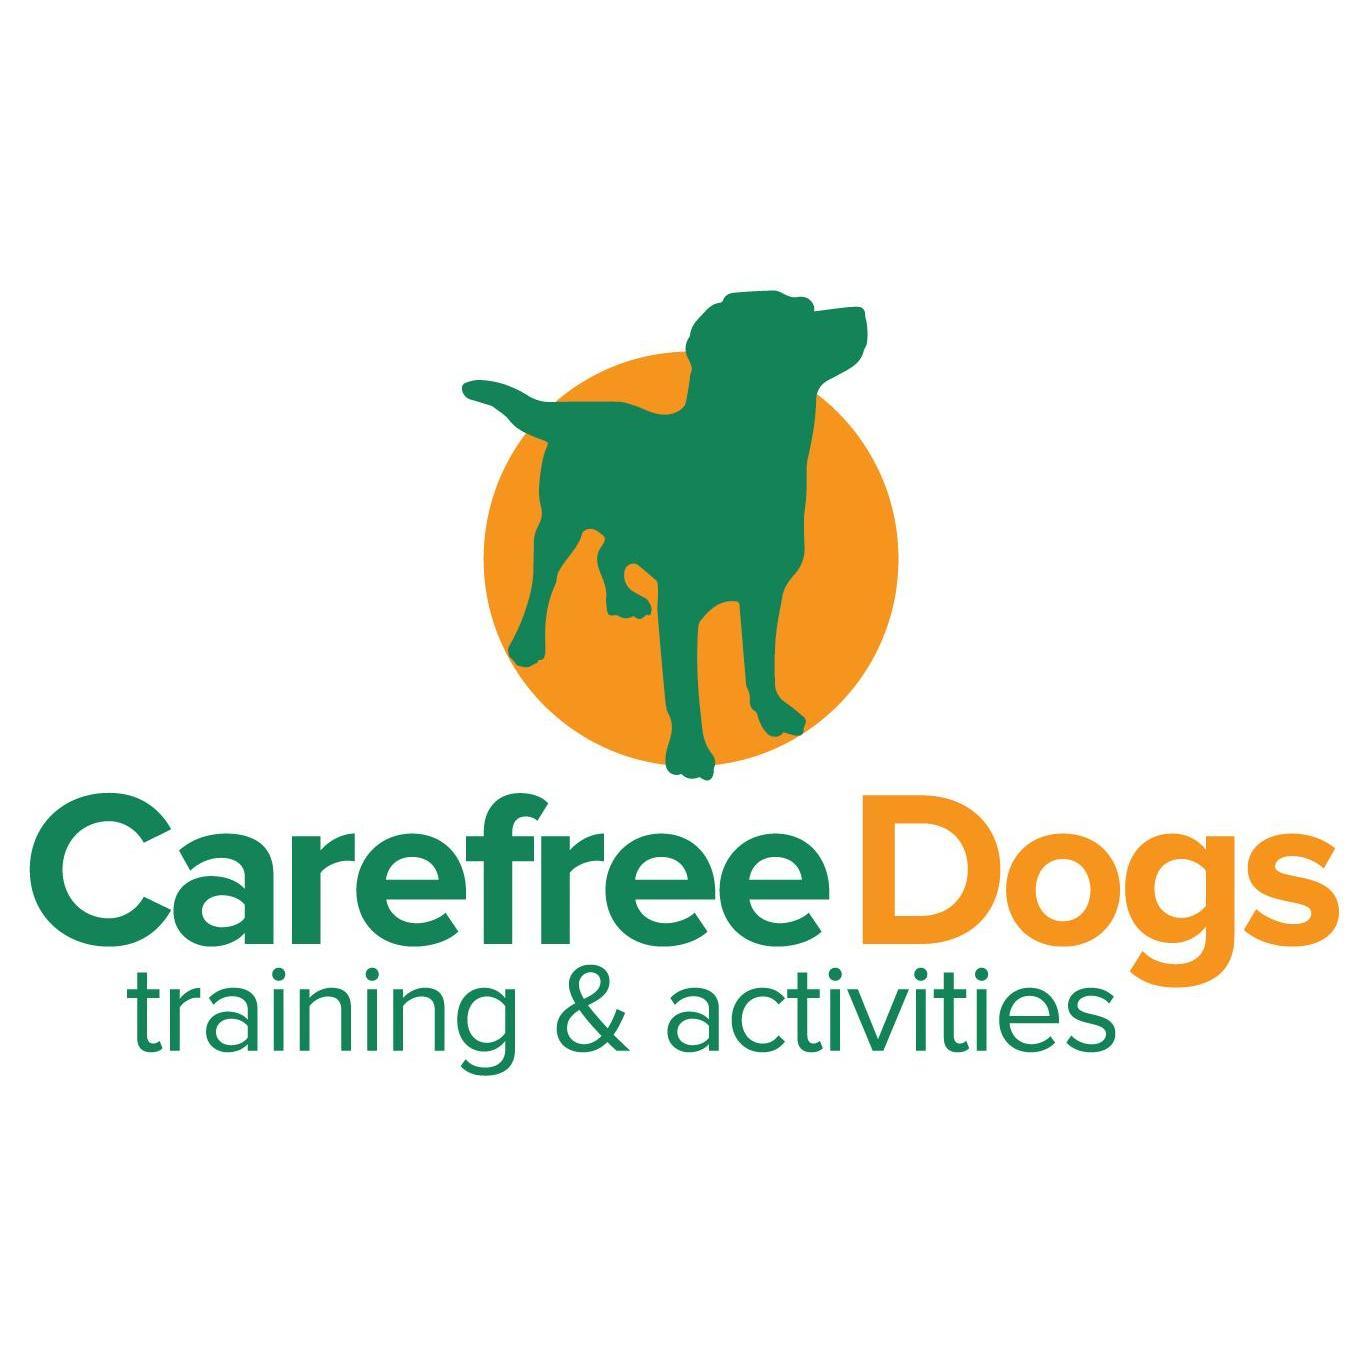 Carefree Dogs - Manningtree, Essex CO11 1JT - 01206 395780 | ShowMeLocal.com